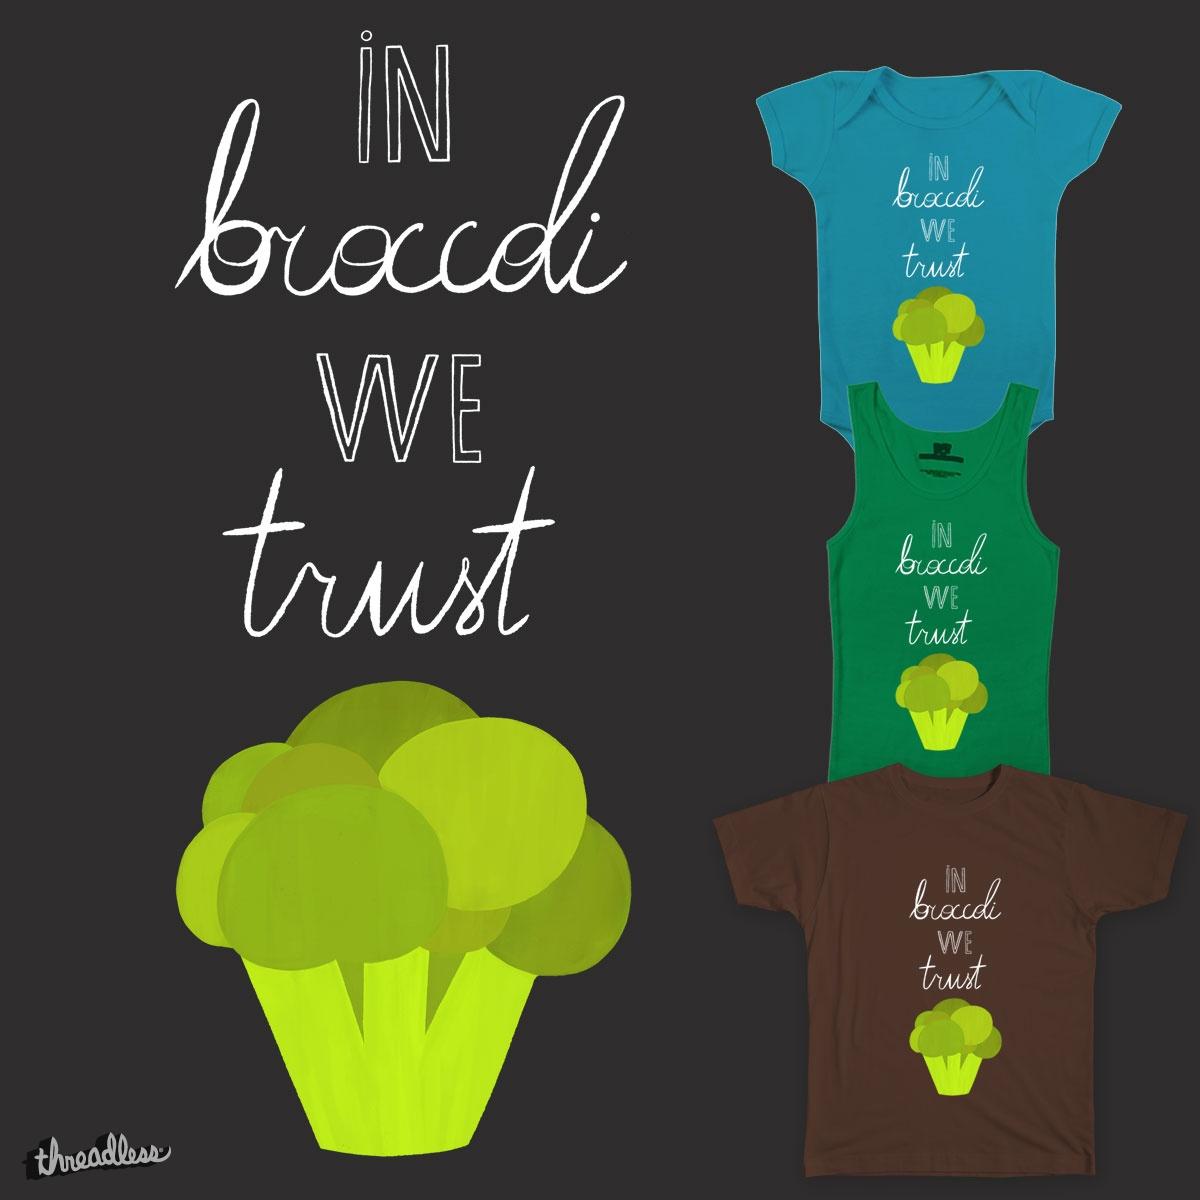 In broccoli we trust by rinomonsta on Threadless